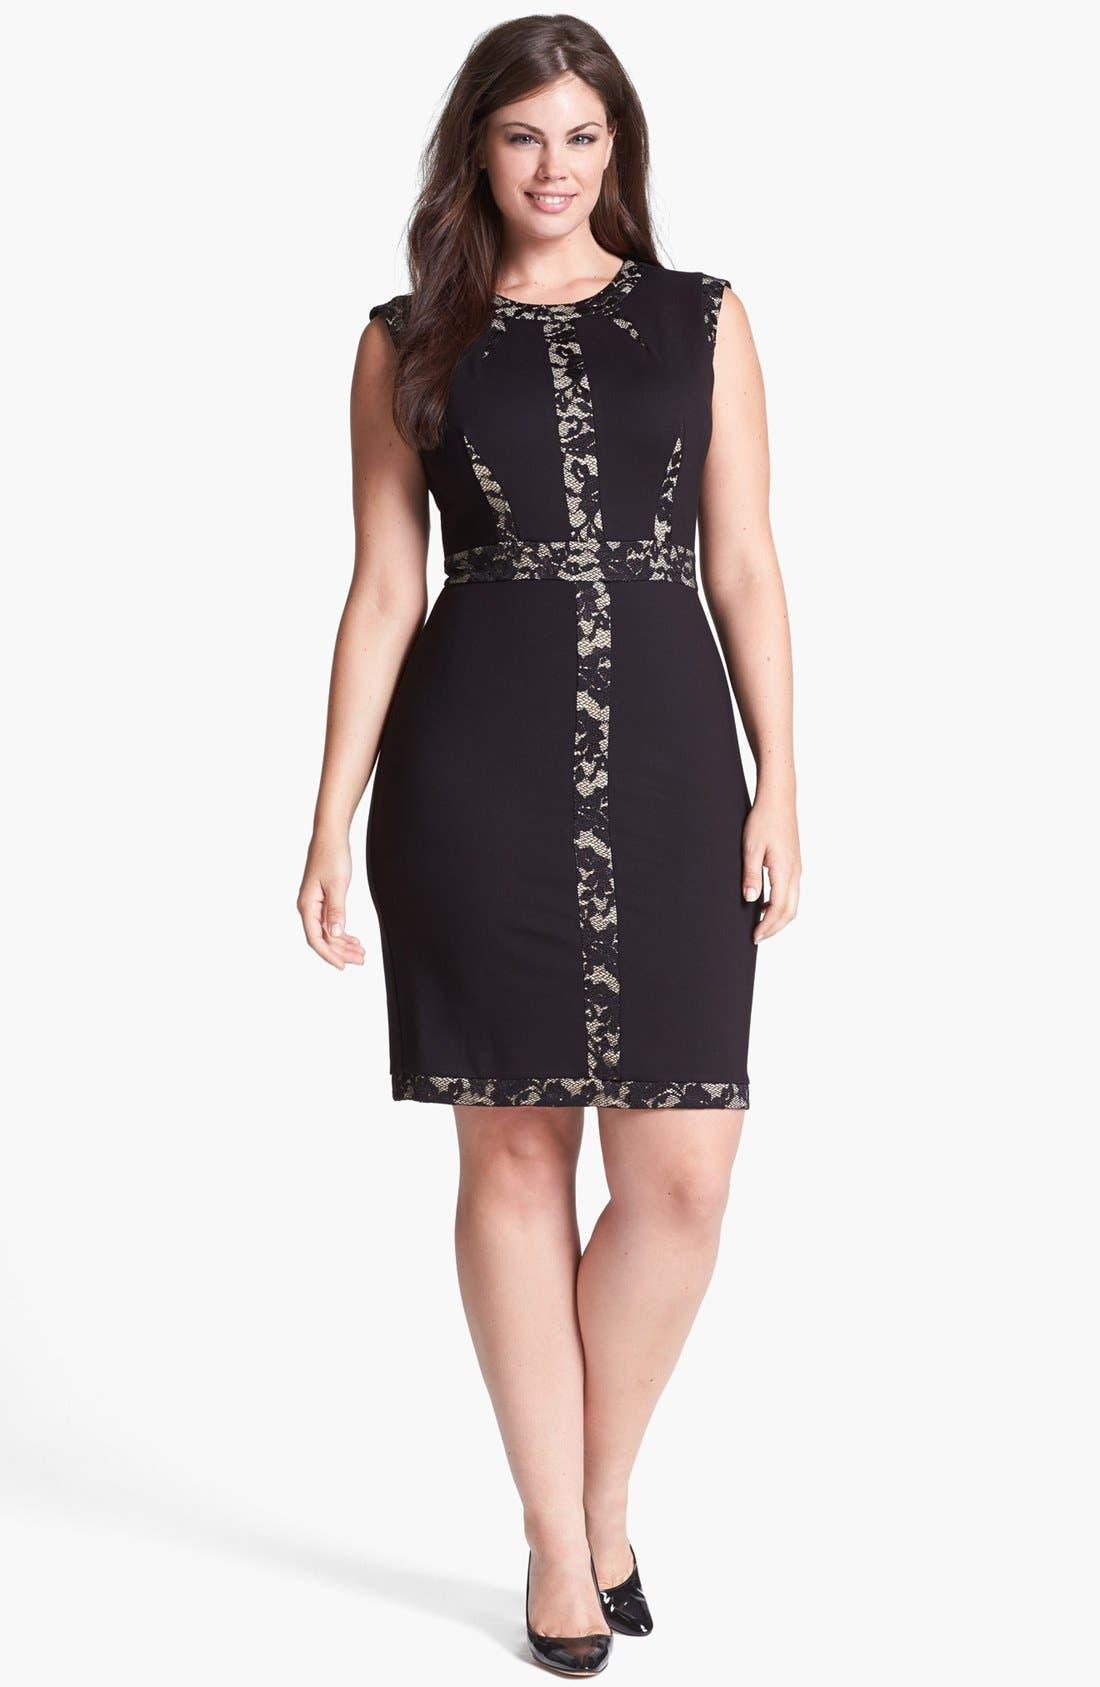 Alternate Image 1 Selected - ABS by Allen Schwartz Lace Block Sheath Dress (Plus Size)